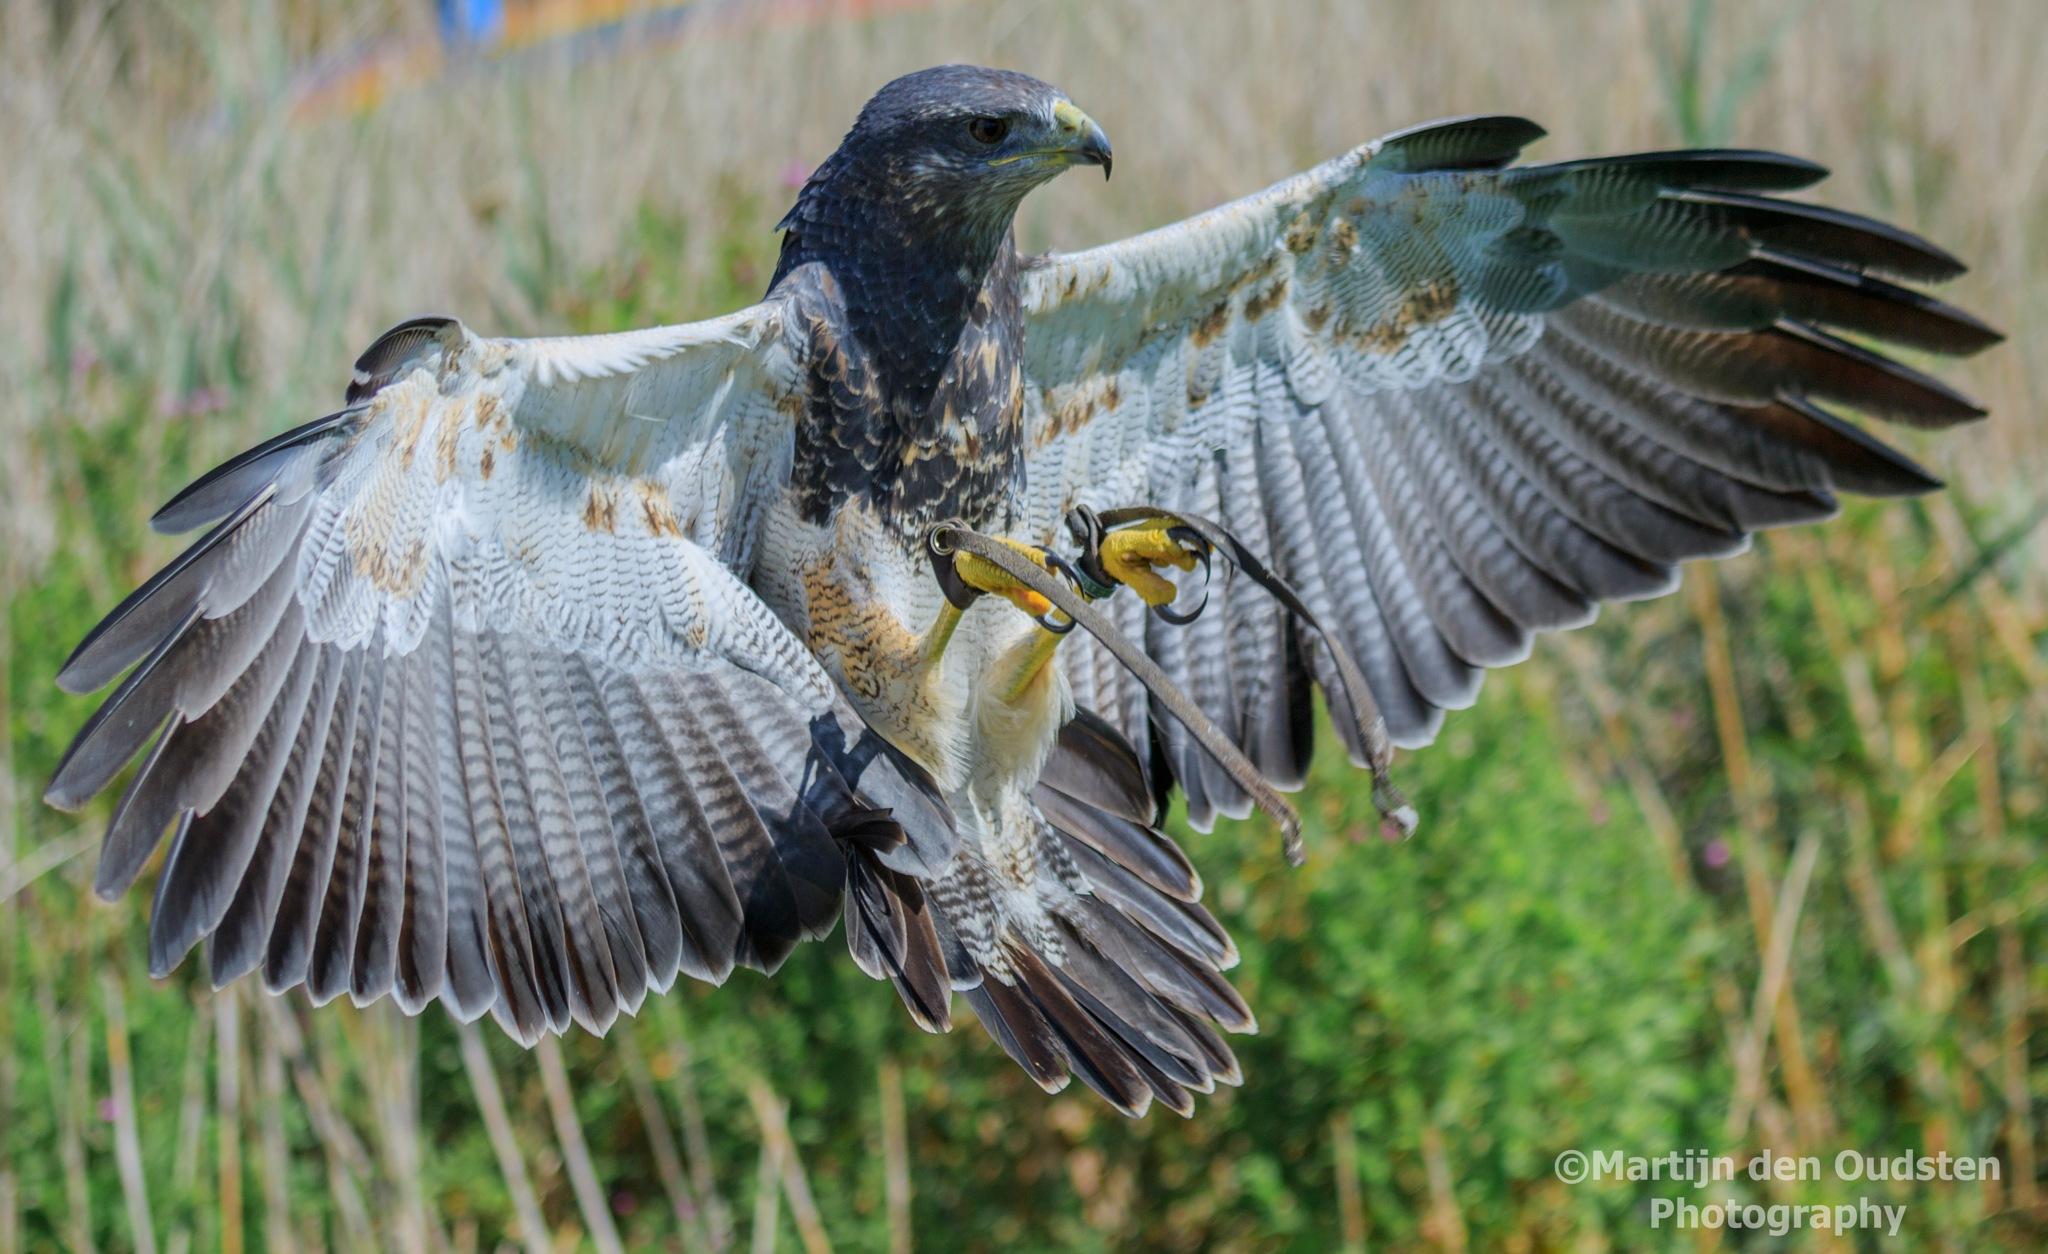 Bird of prey by Martijn Den Oudsten